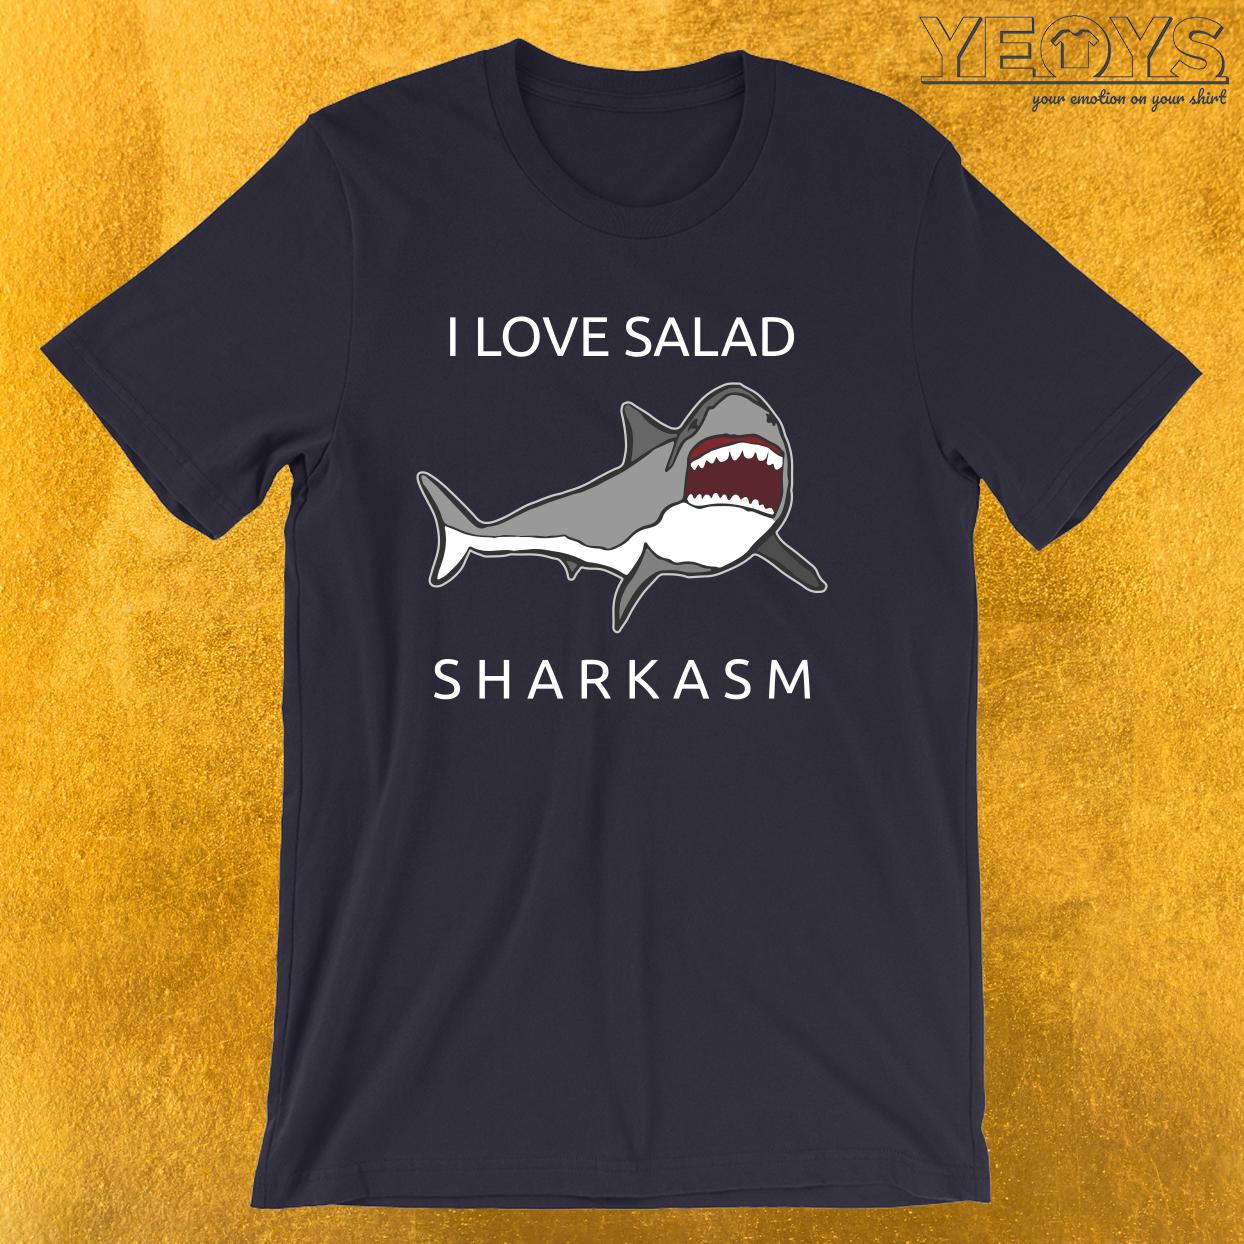 Funny Shark Pun – I Love Salad Sharkasm Tee